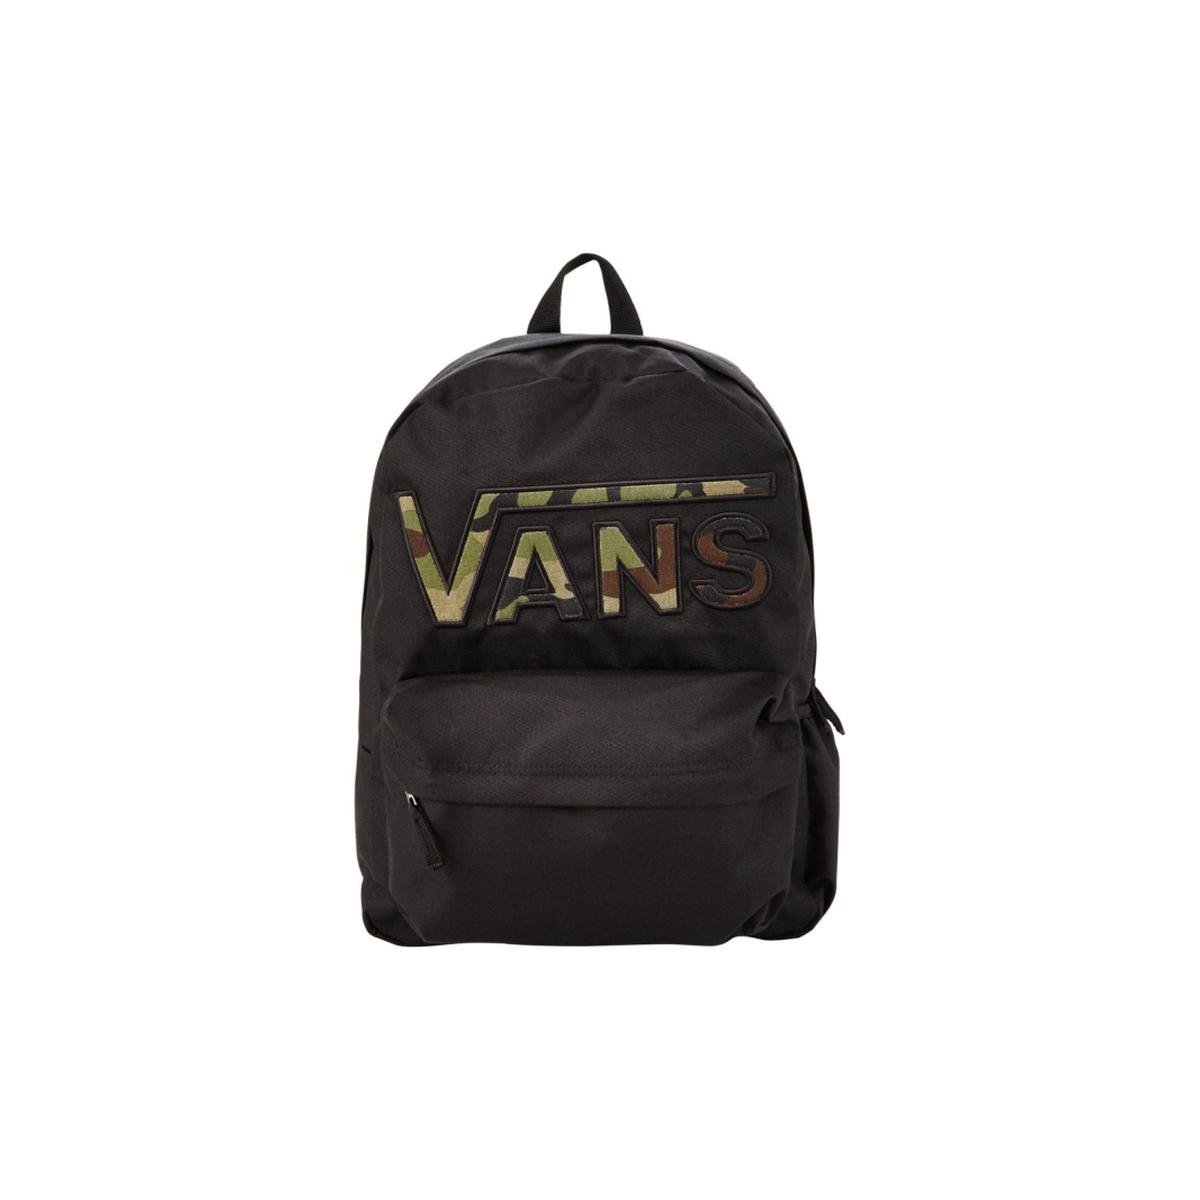 Plecak Vans Realm Flying V Black Camo : Hulajnogi